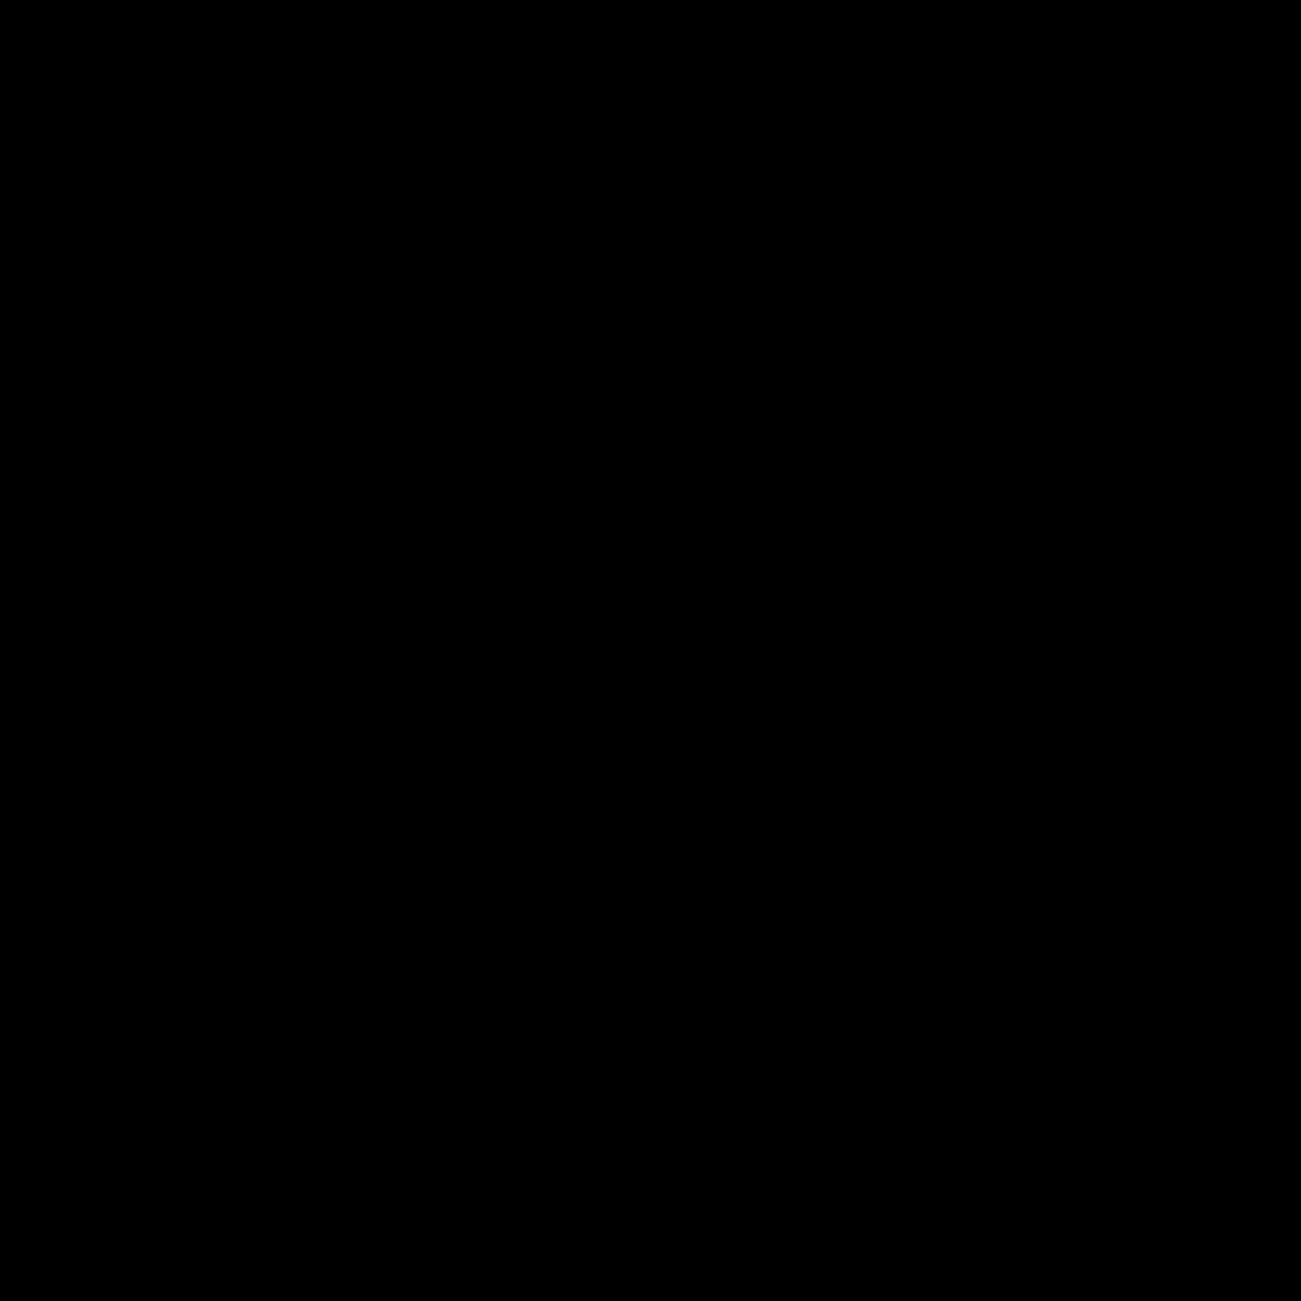 White Instagram Logo Png (1600x1600)